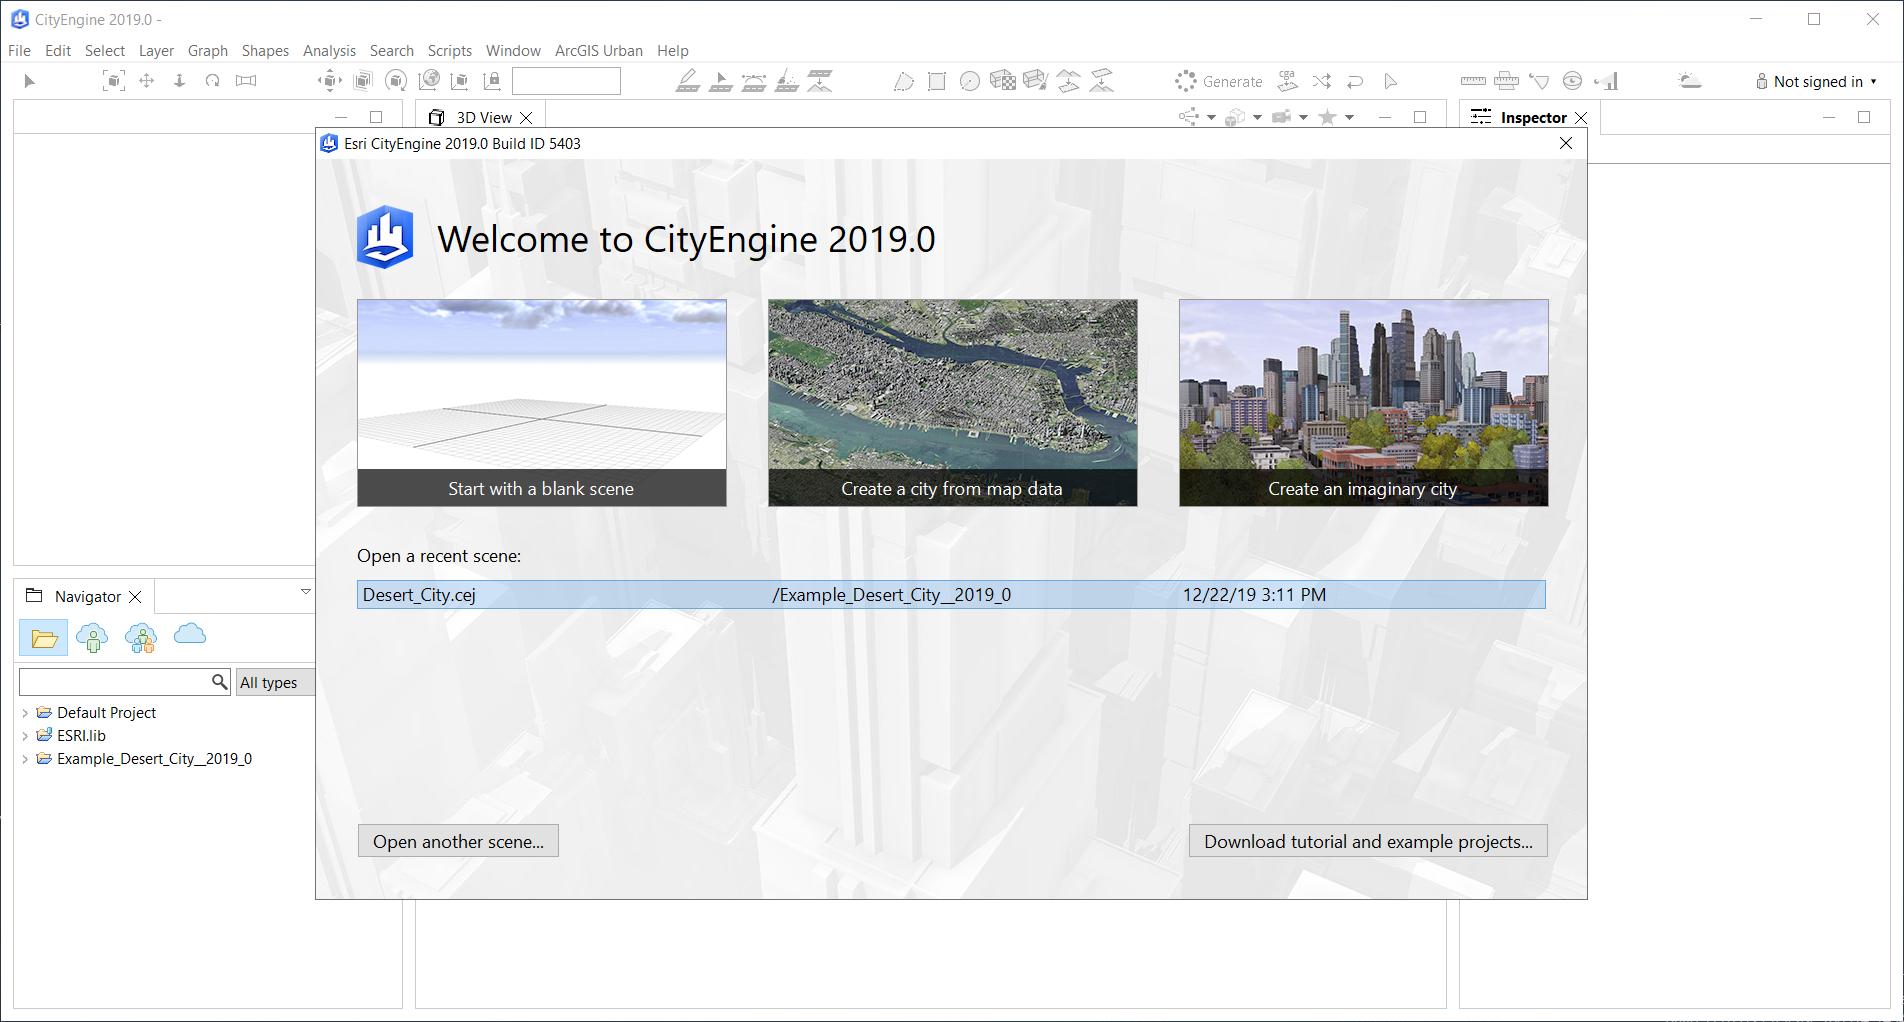 Esri CityEngine 2019.0.5403 x64 full license